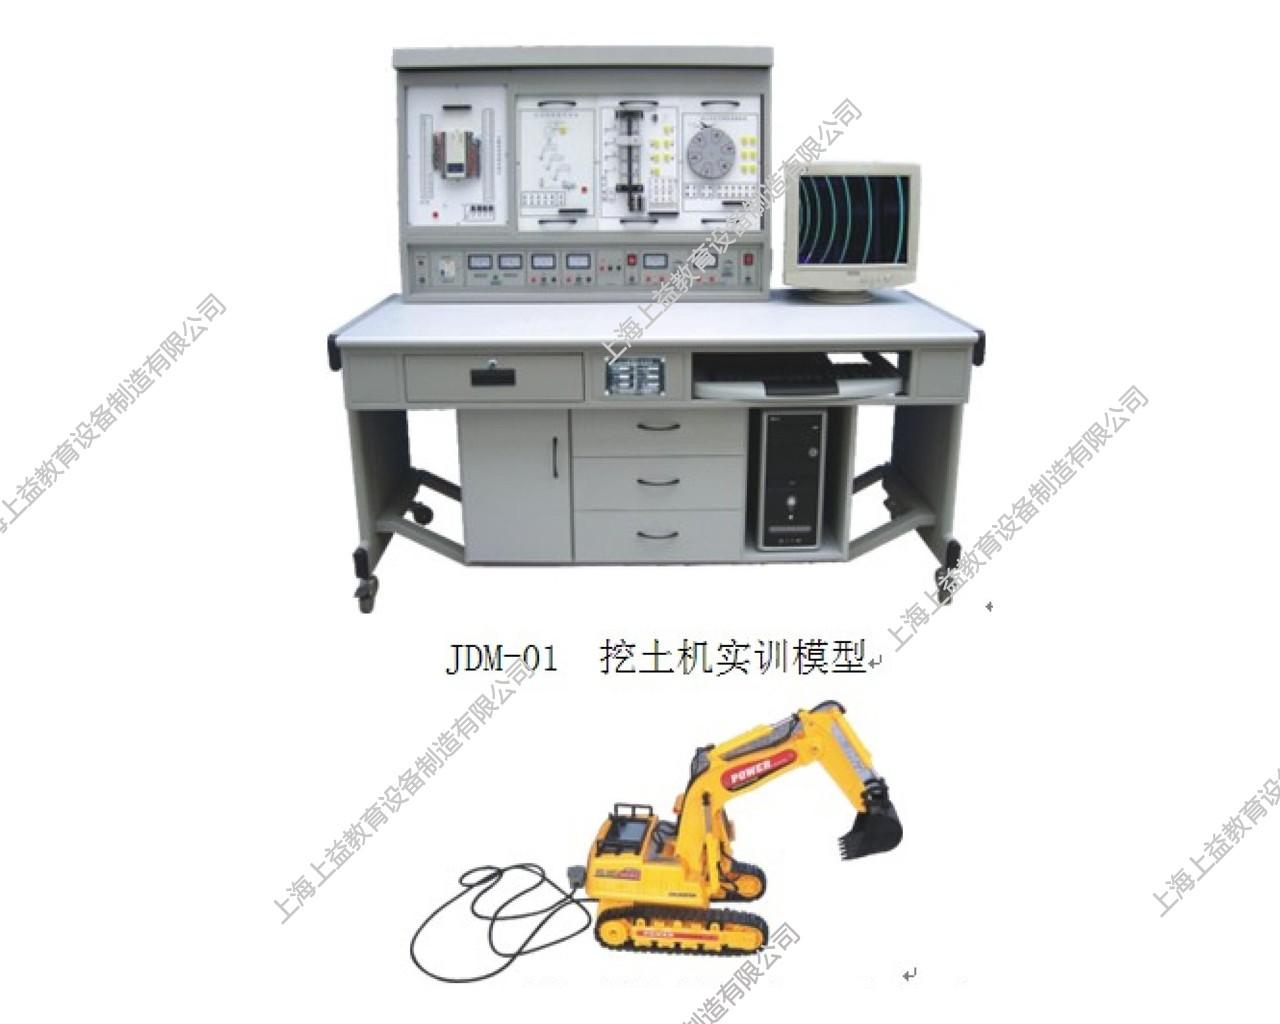 SYPLC-102DPLC可编程控制器/微机接口及微机应用综合装置